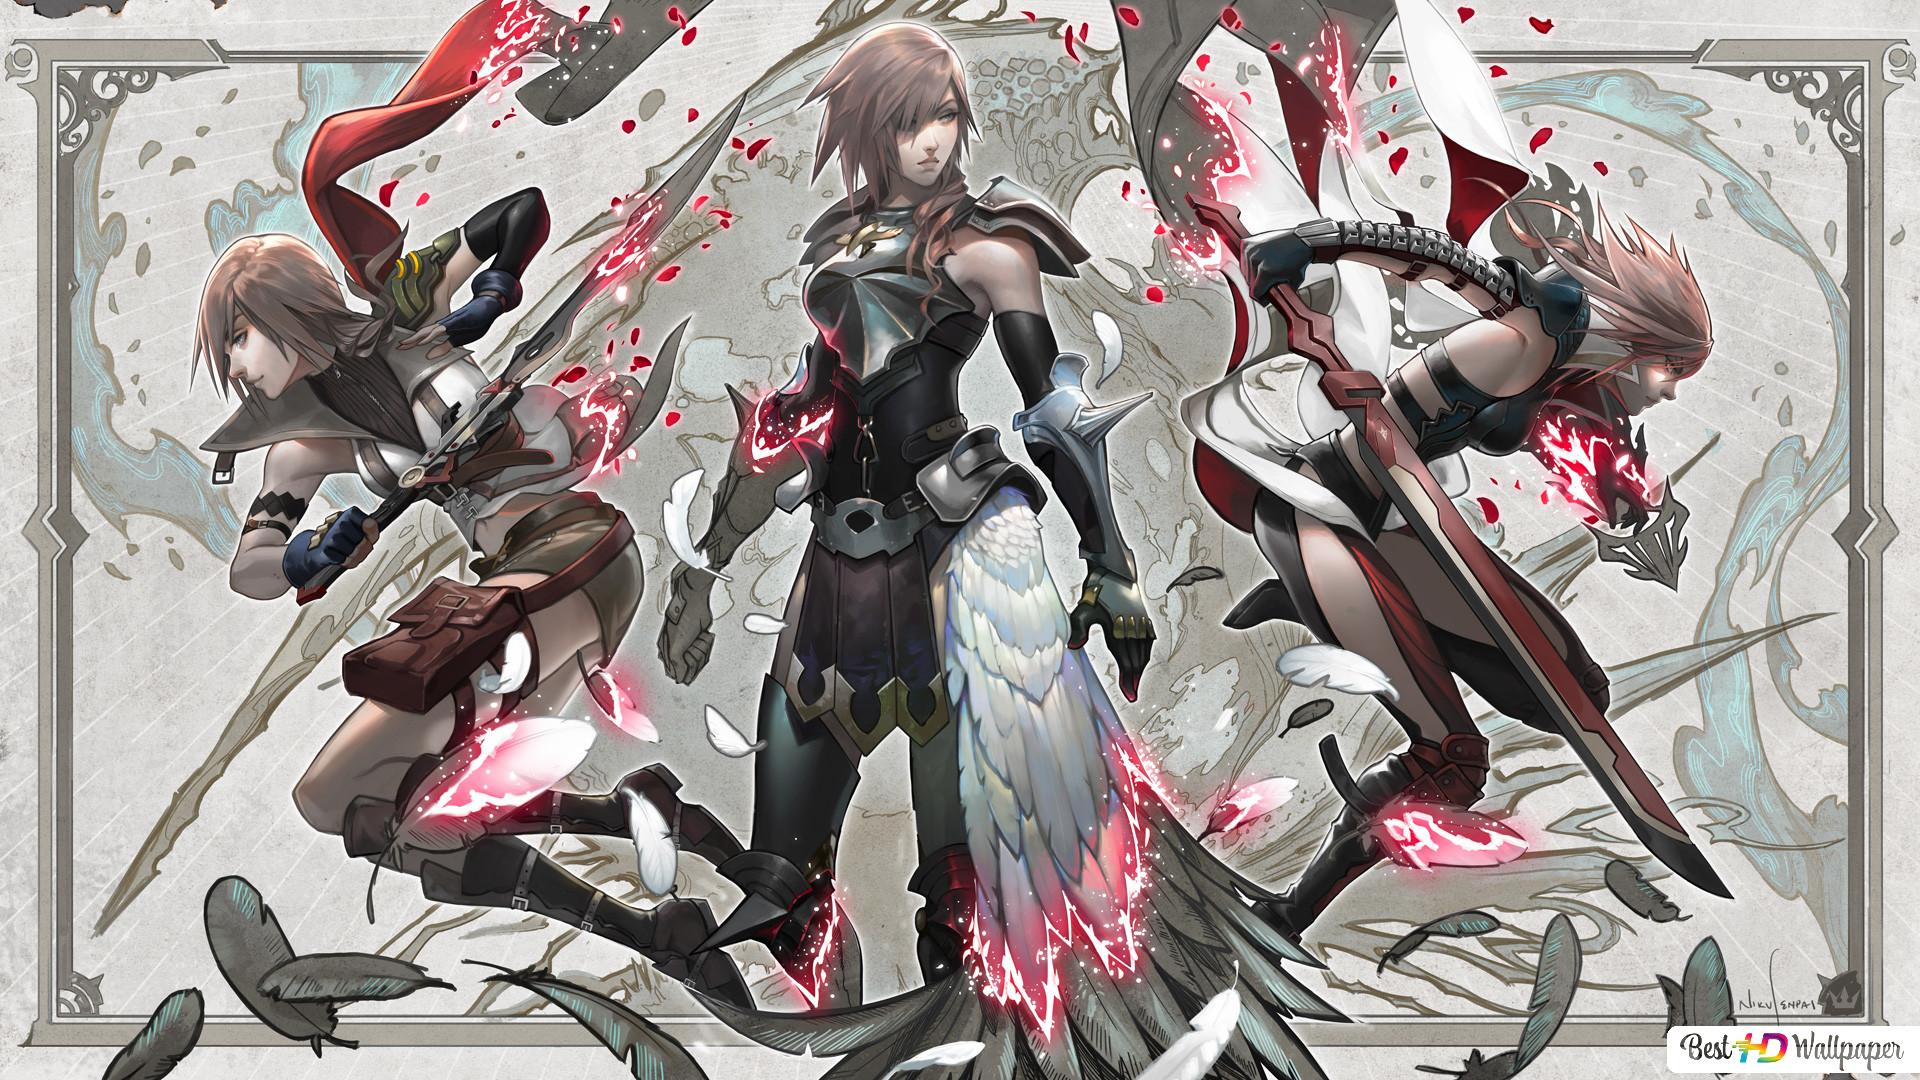 Final Fantasy Xiii Lightning The Goddess Hd Wallpaper Download